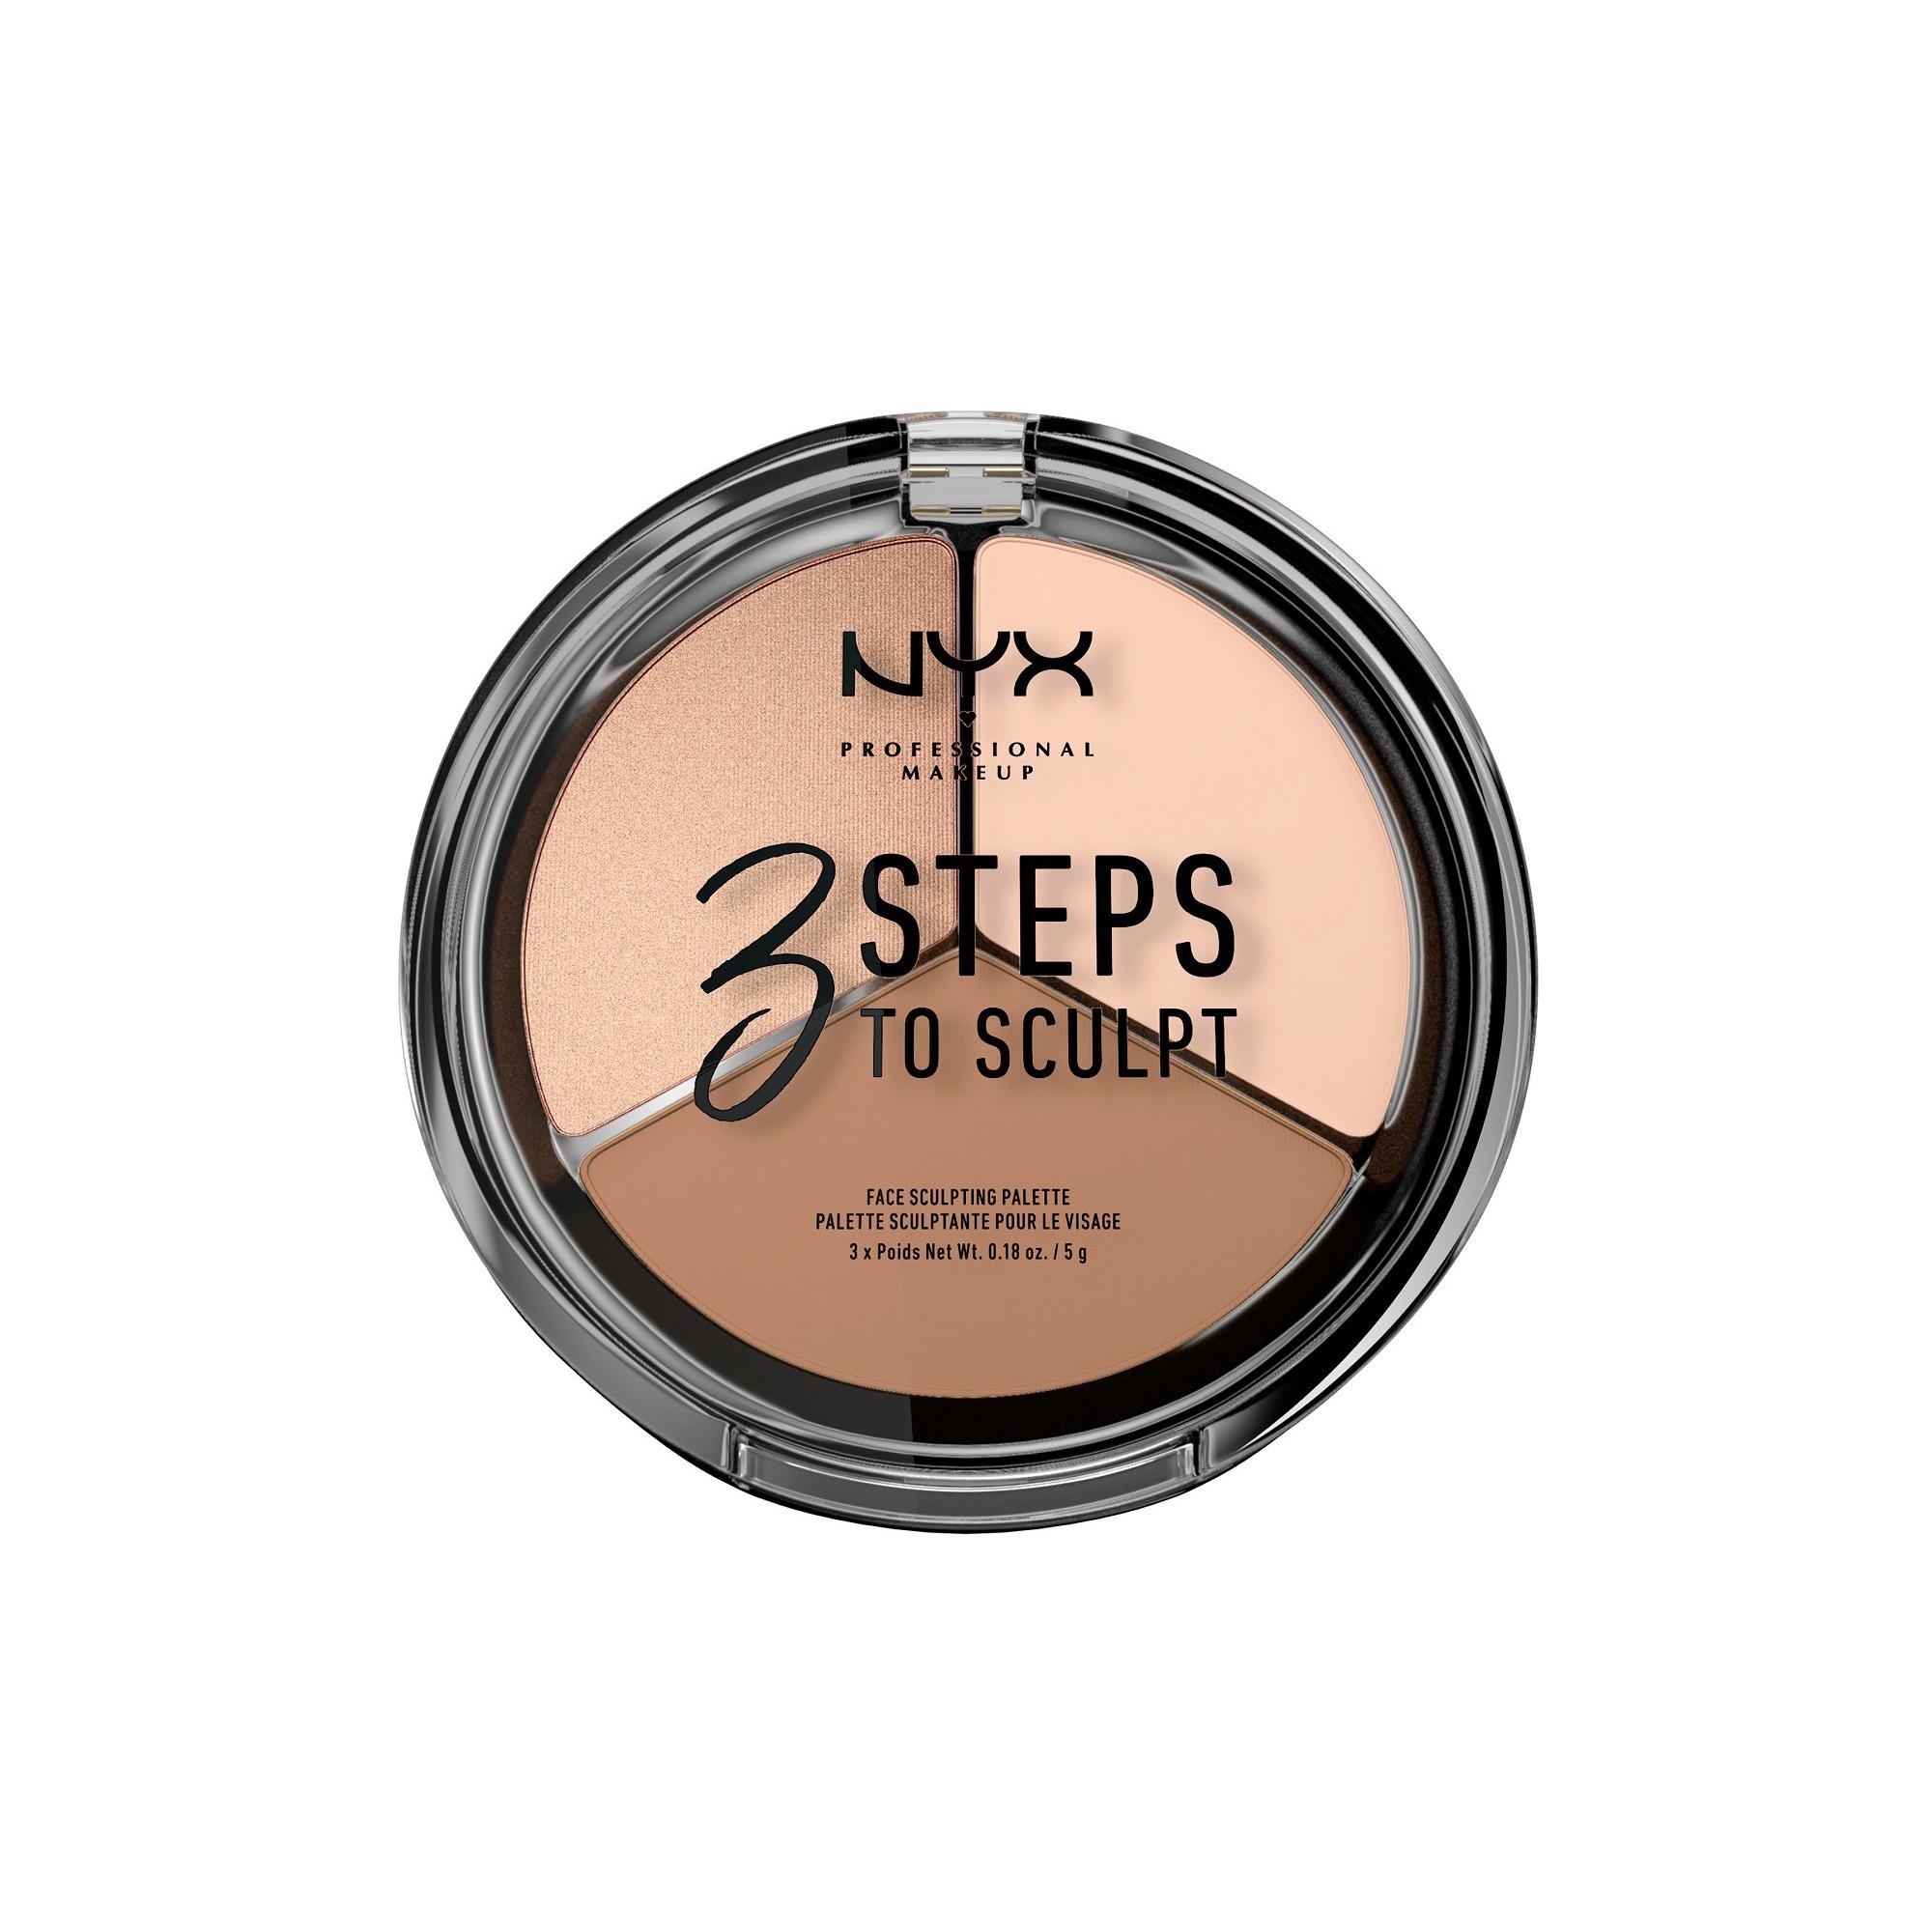 NYX Professional Makeup 3 Steps to Sculpt Fair Контурный